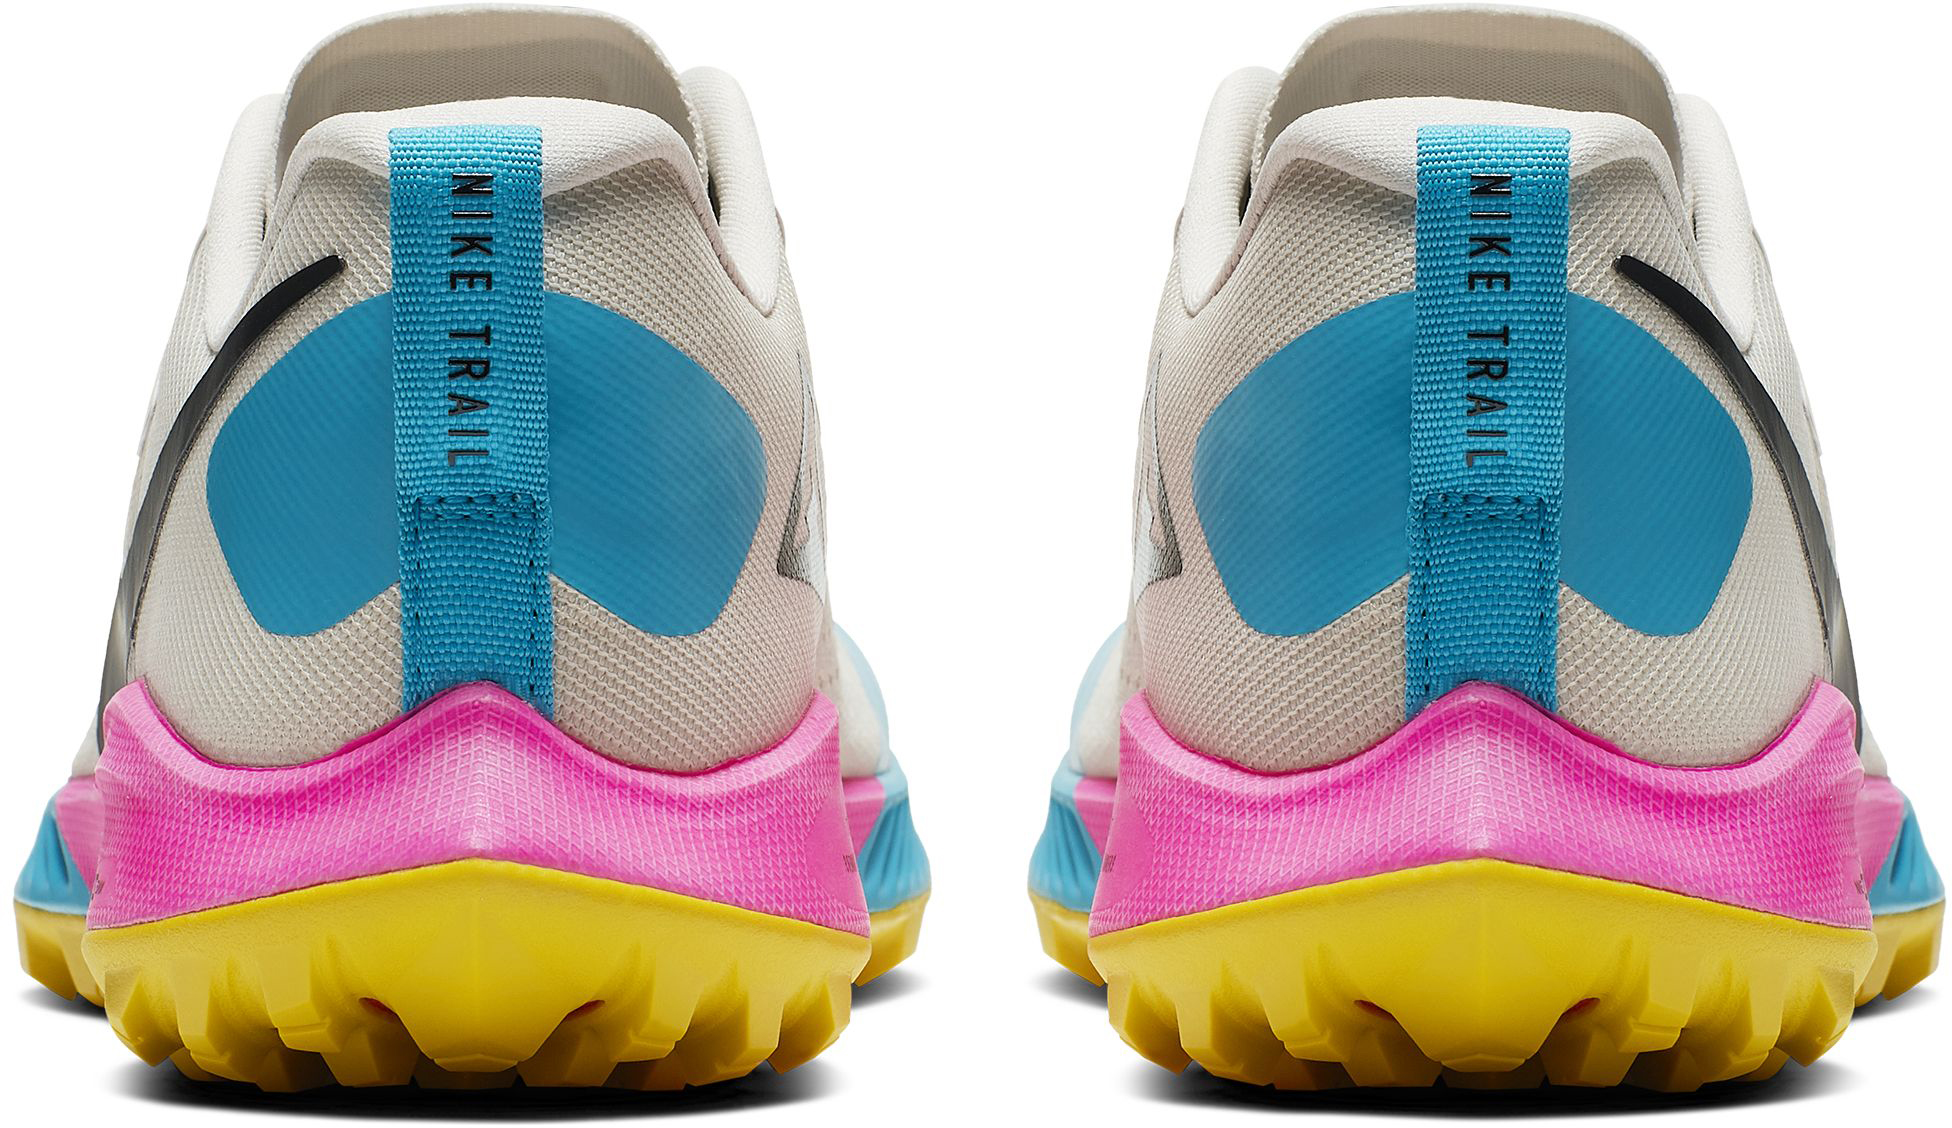 9f11dd4d98d51 Nike Air Zoom Terra Kiger 5 Trail Running Shoes - Women s